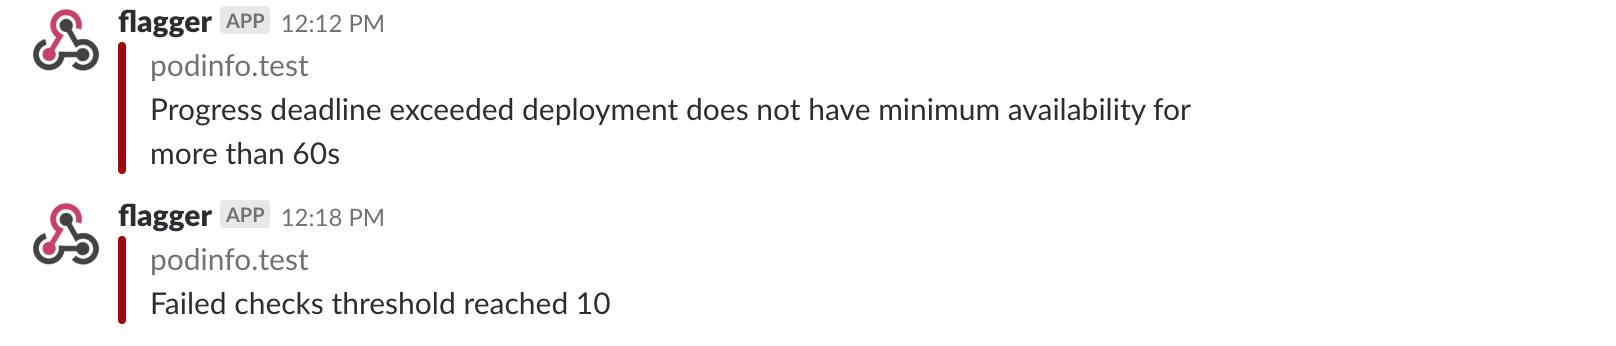 Flagger Slack Notifications